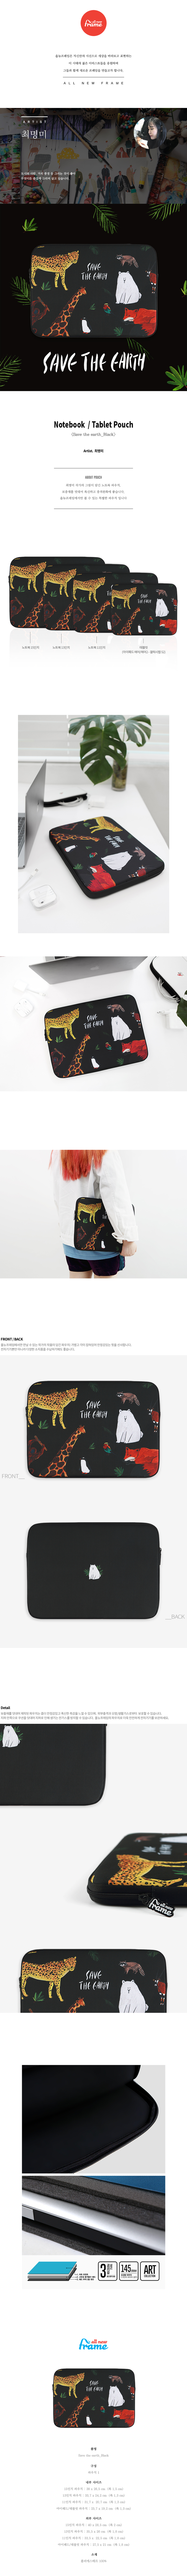 Save the earth_Black (아이패드-11-13-15형) - 올뉴프레임, 23,000원, 노트북 케이스/파우치, 27.94cm~33.78cm